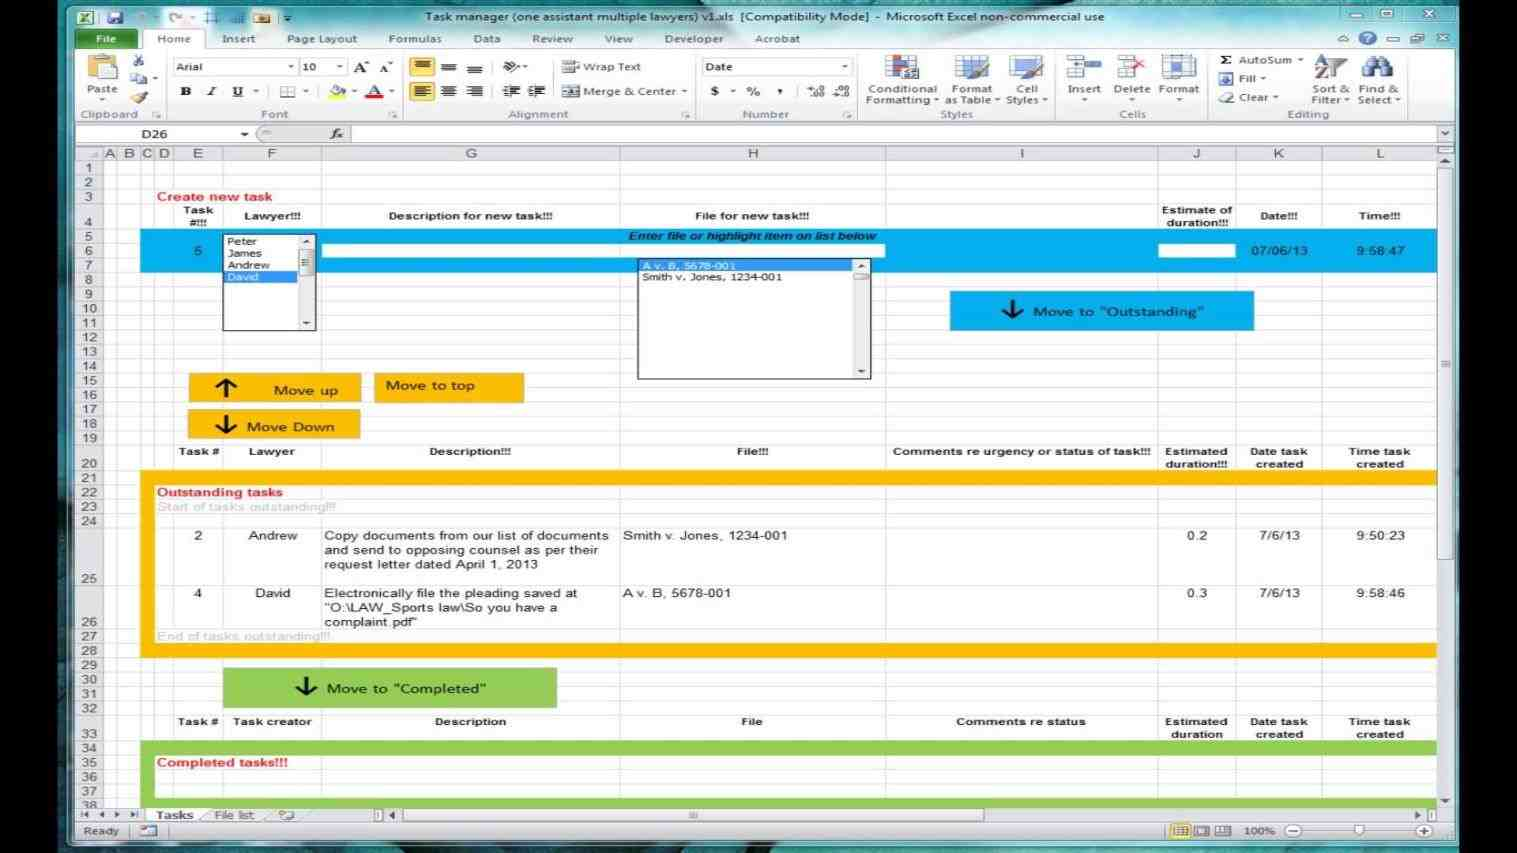 youtuberhyoutubecom client database template choice image templates example rhalramiinfo client Excel Client Database Template database template excel choice image templates example